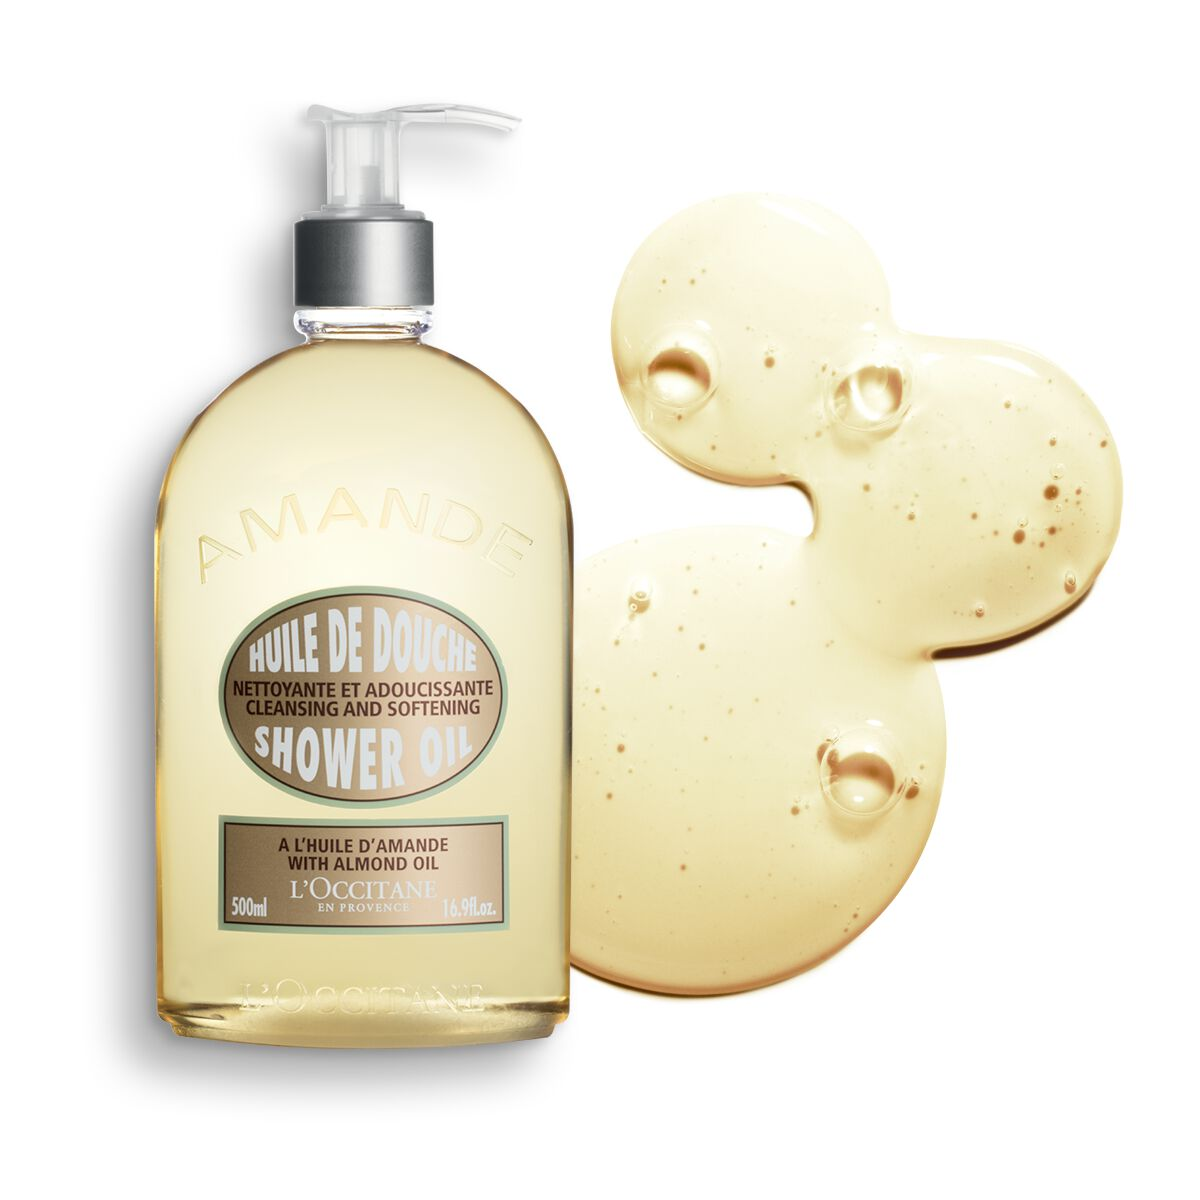 Almond Shower Oil 16.9 fl. oz.